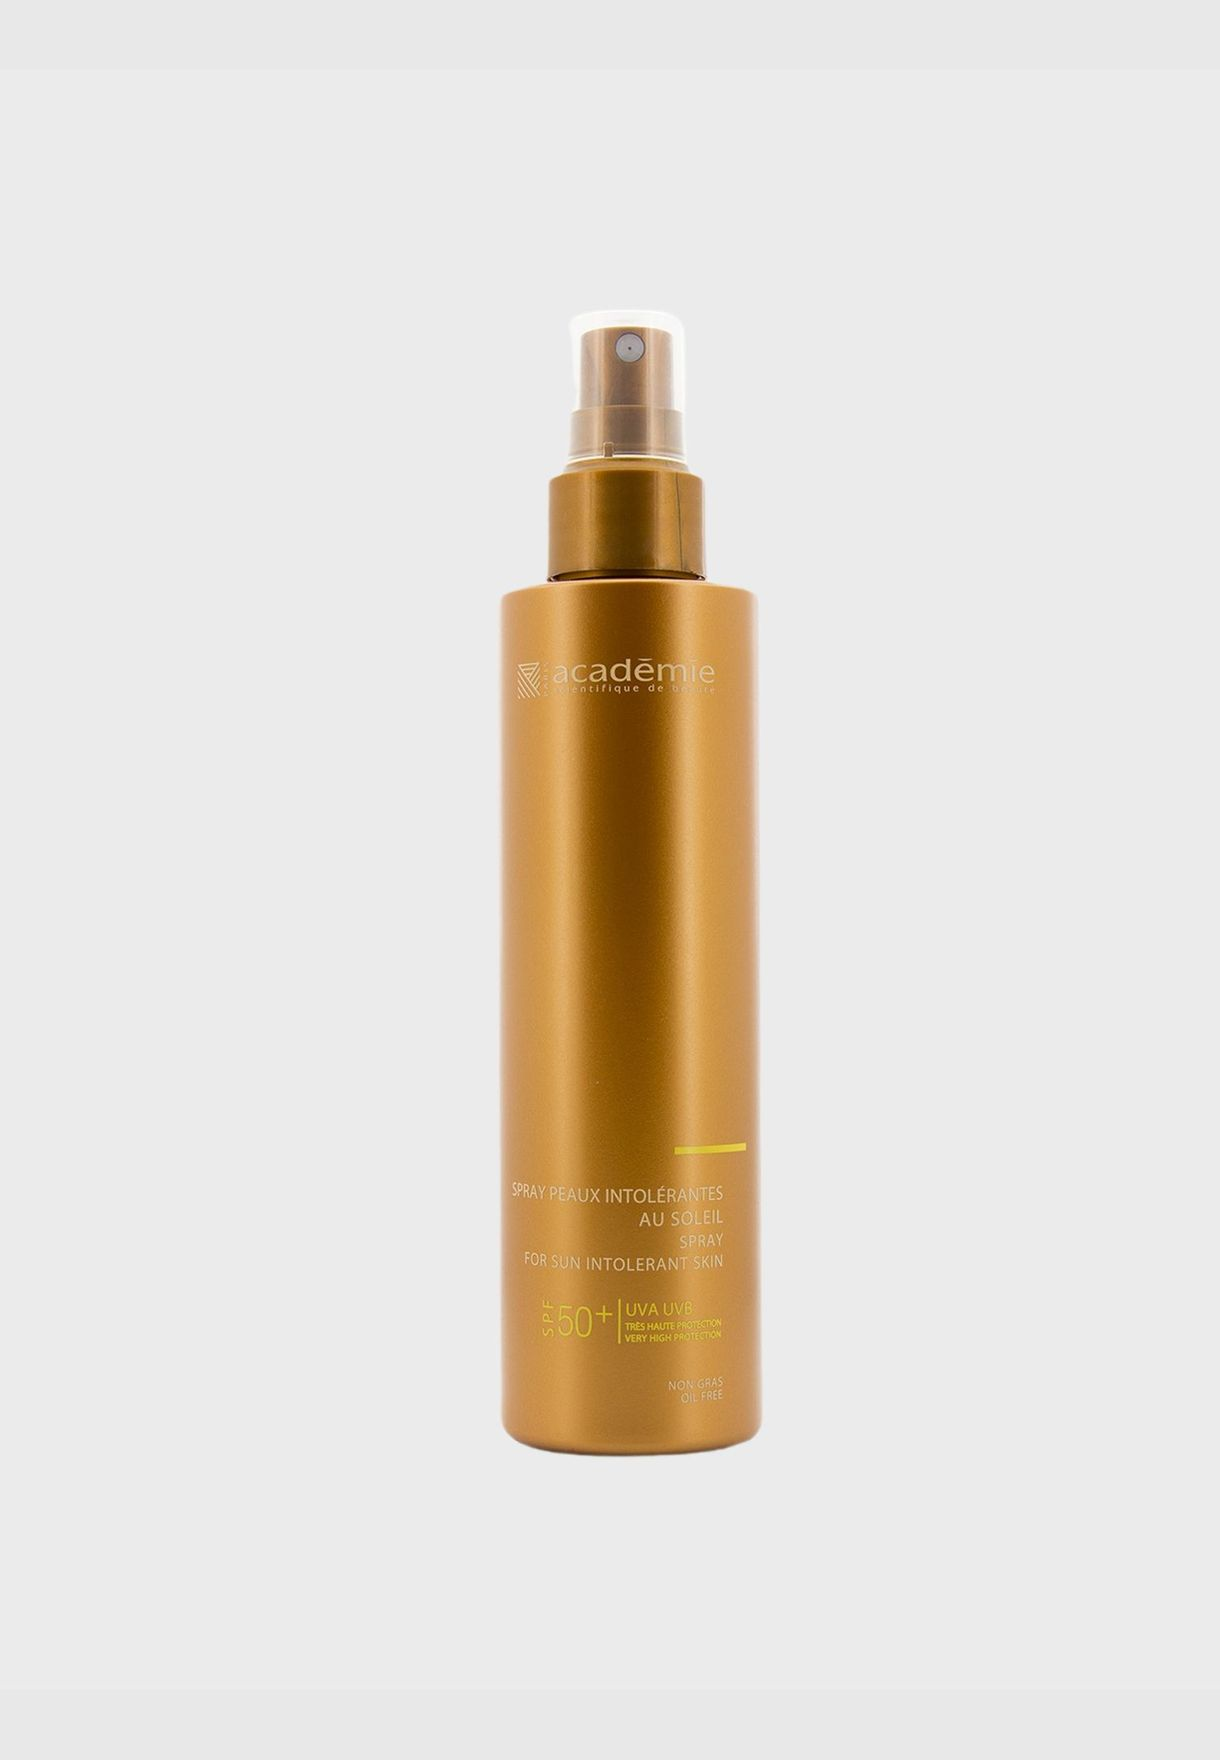 Spray For Sun Intolerant Skin SPF 50+ - Oil Free